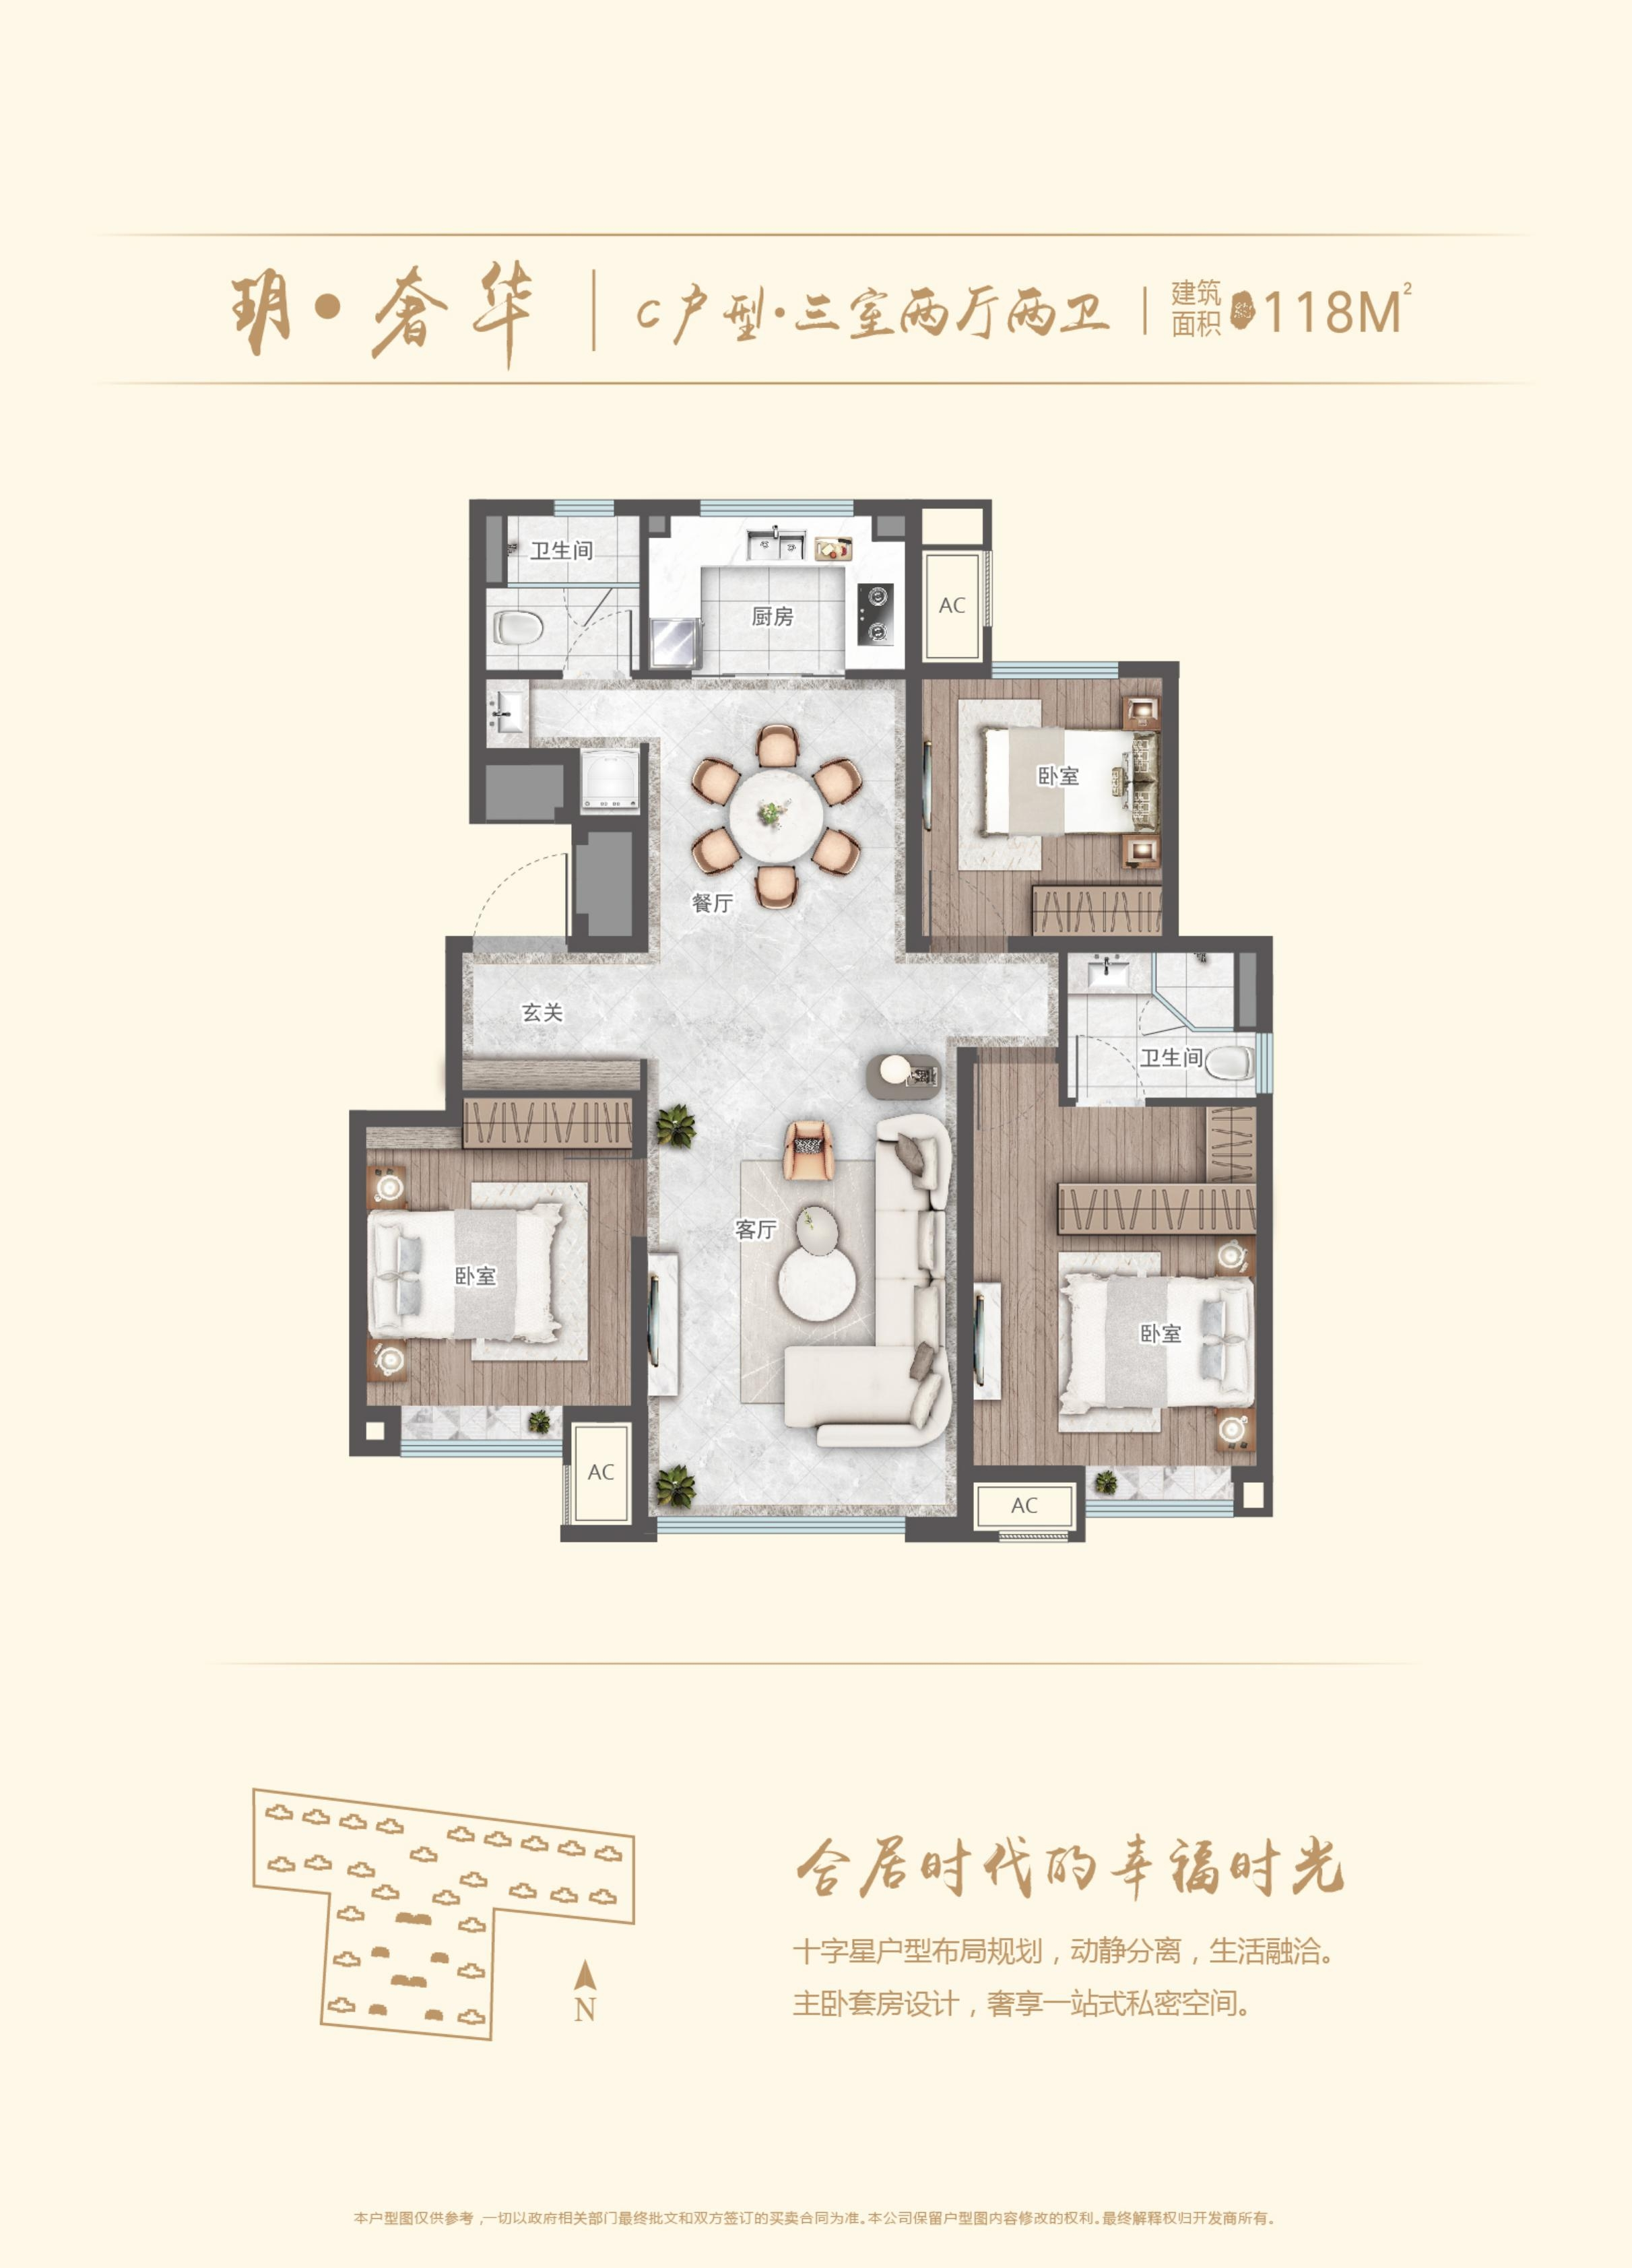 C户型 建筑面积约118平米 三室两厅两卫